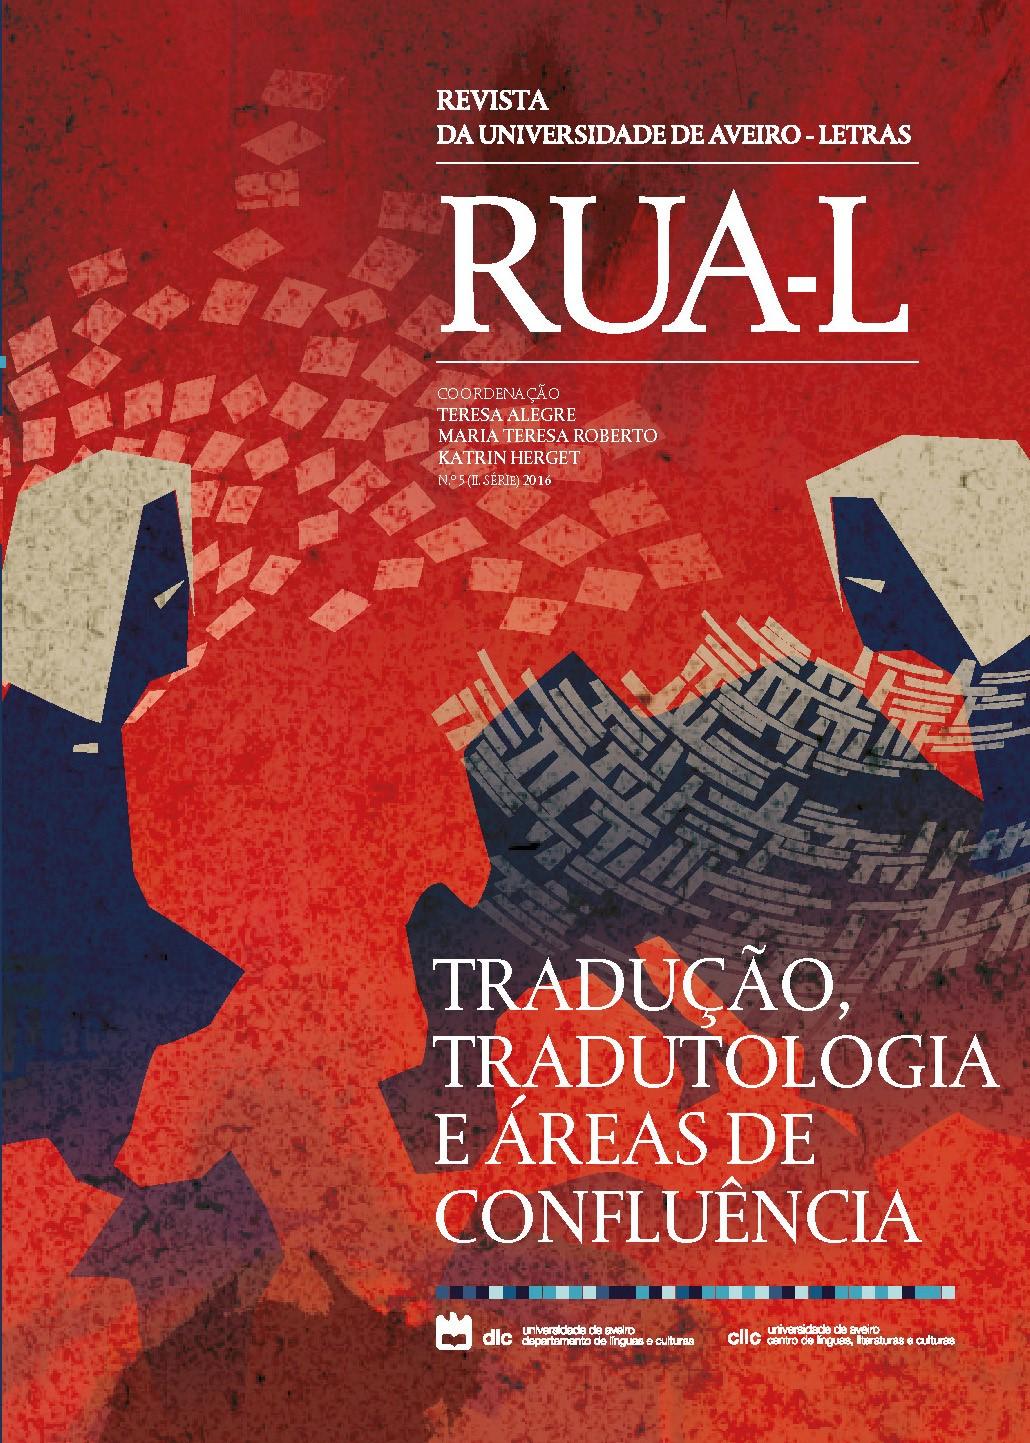 Capa do nº 5 (2016) da revista RUA-L